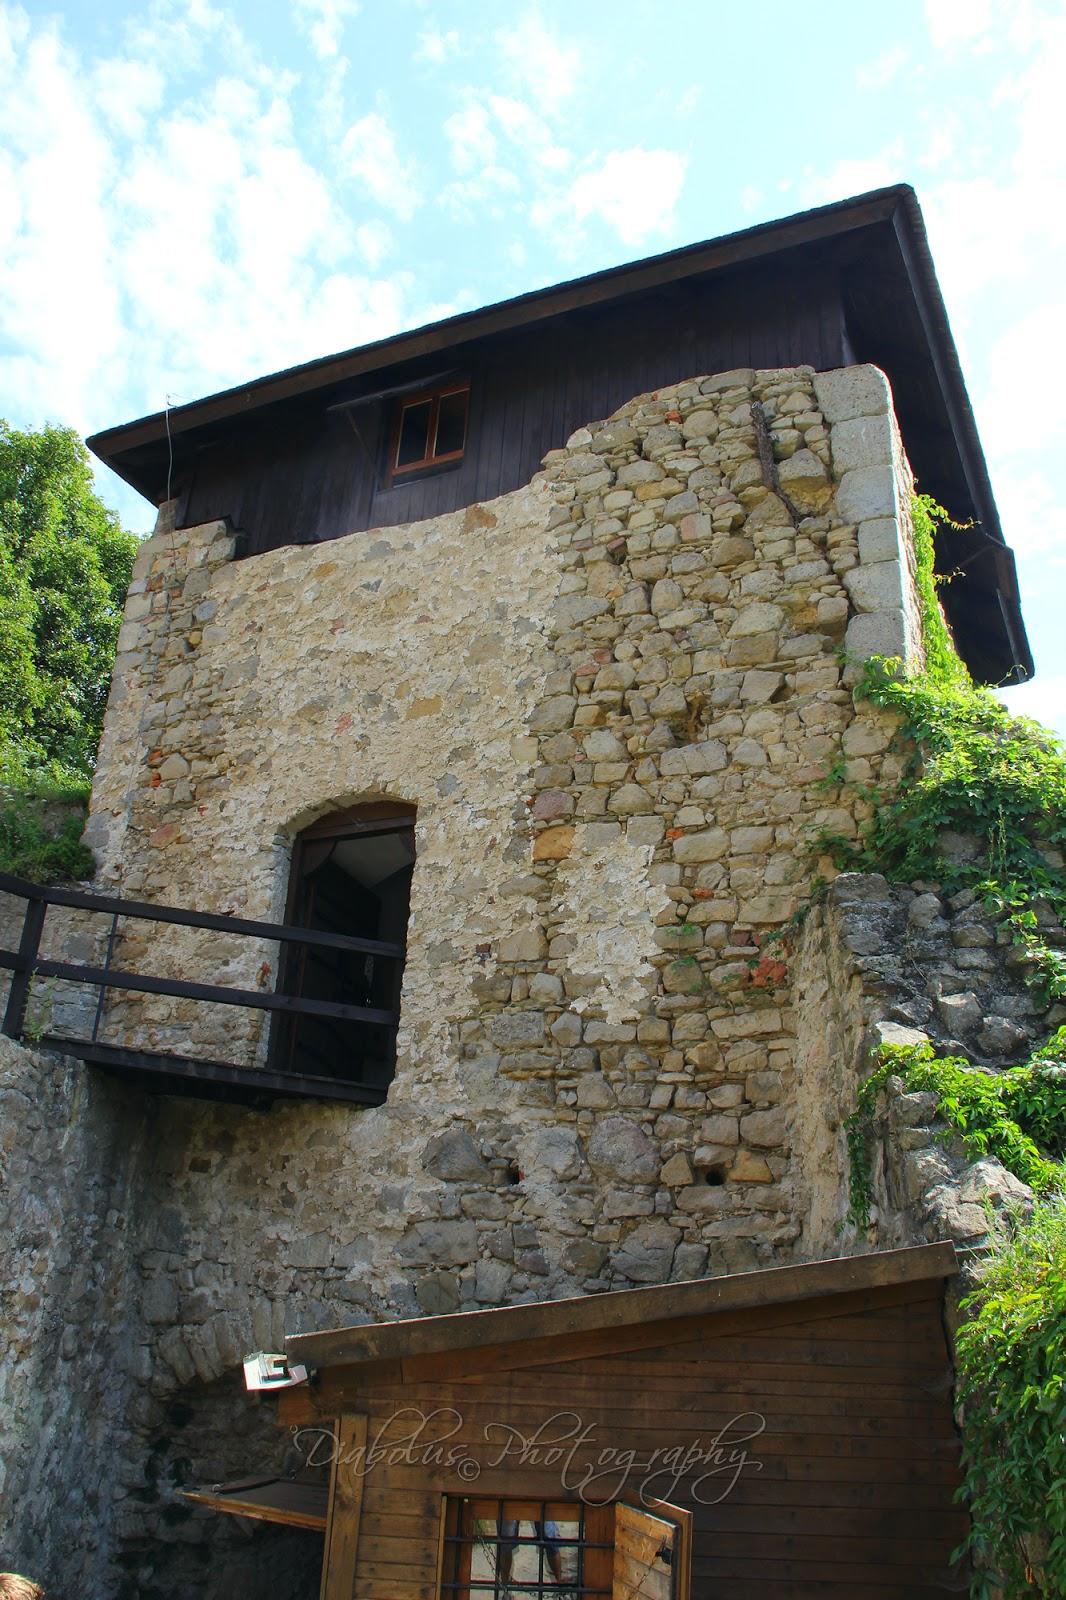 Hrad Lukov/Lukov Castle